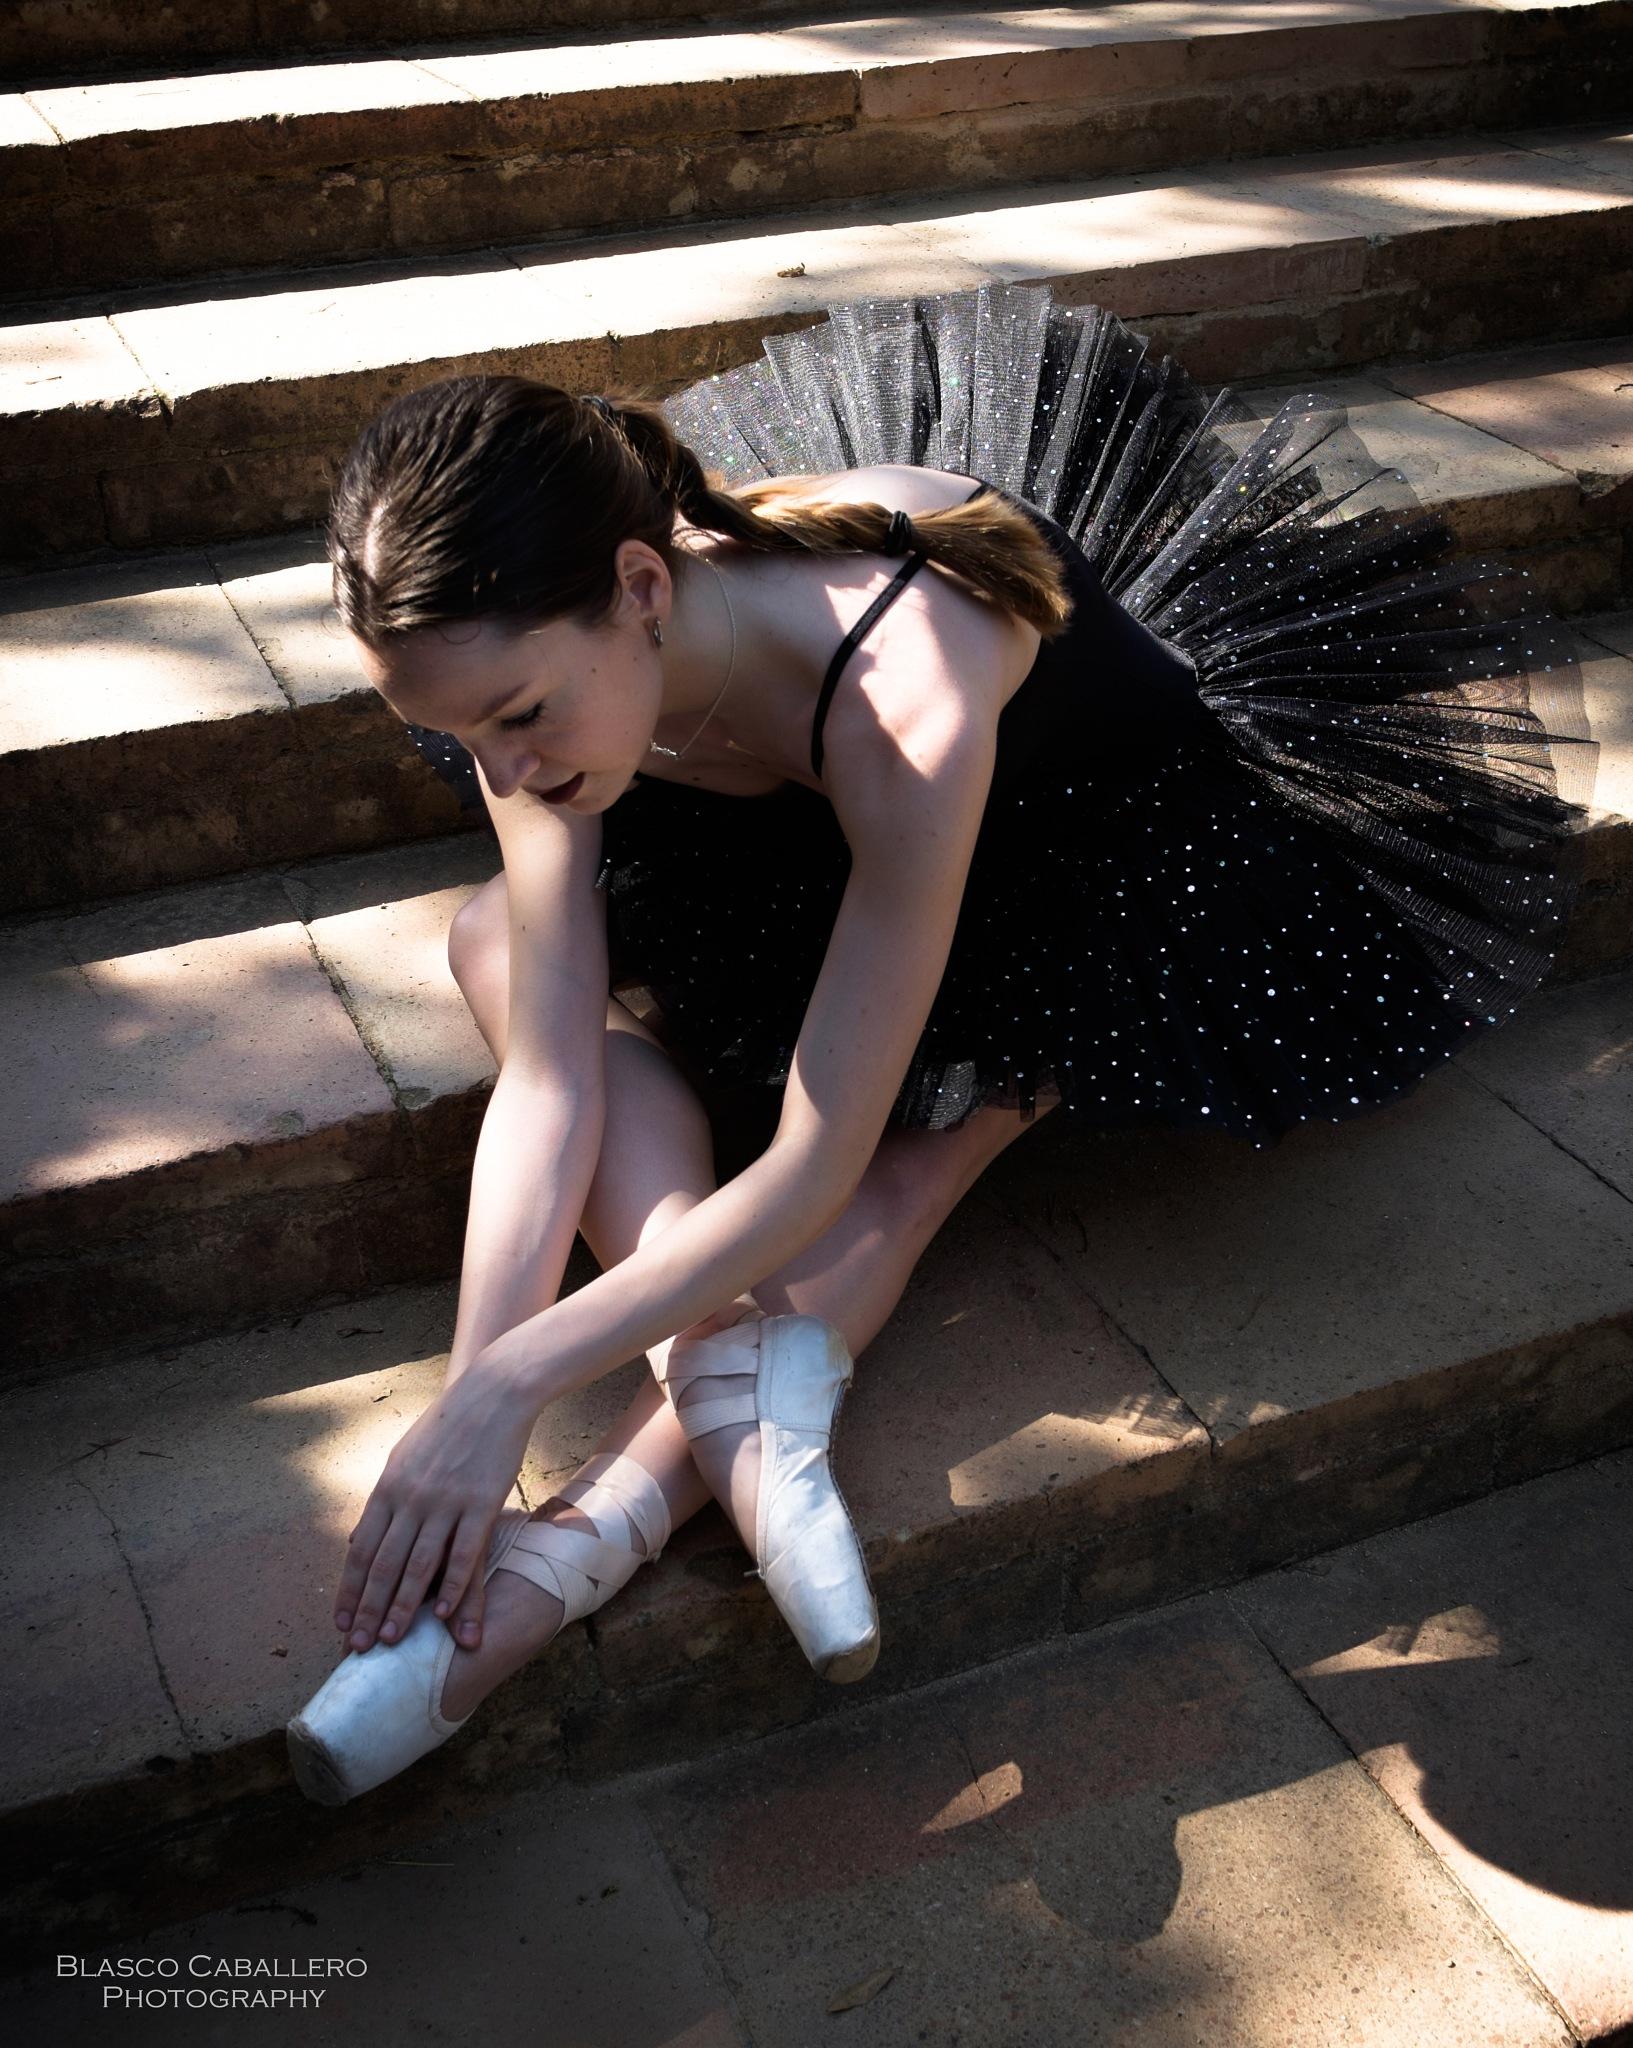 Ballet dancer by Blasco Caballero